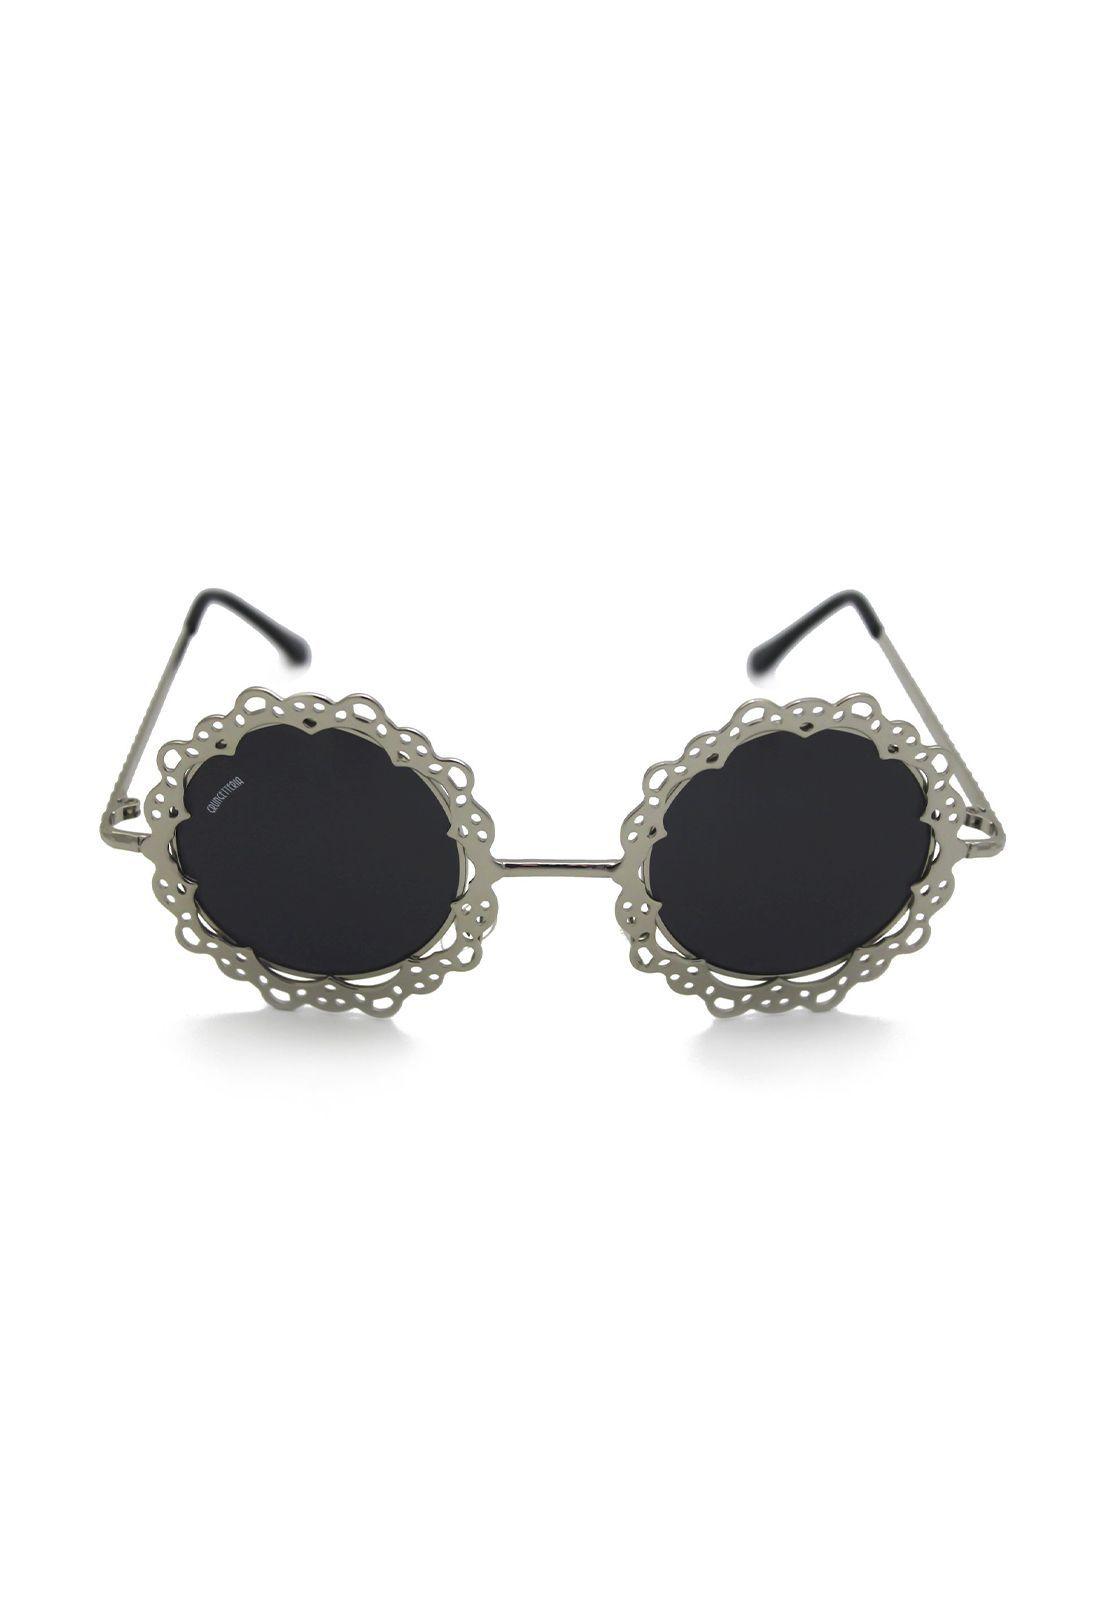 Óculos de Sol Grungetteria Flower Power Prata